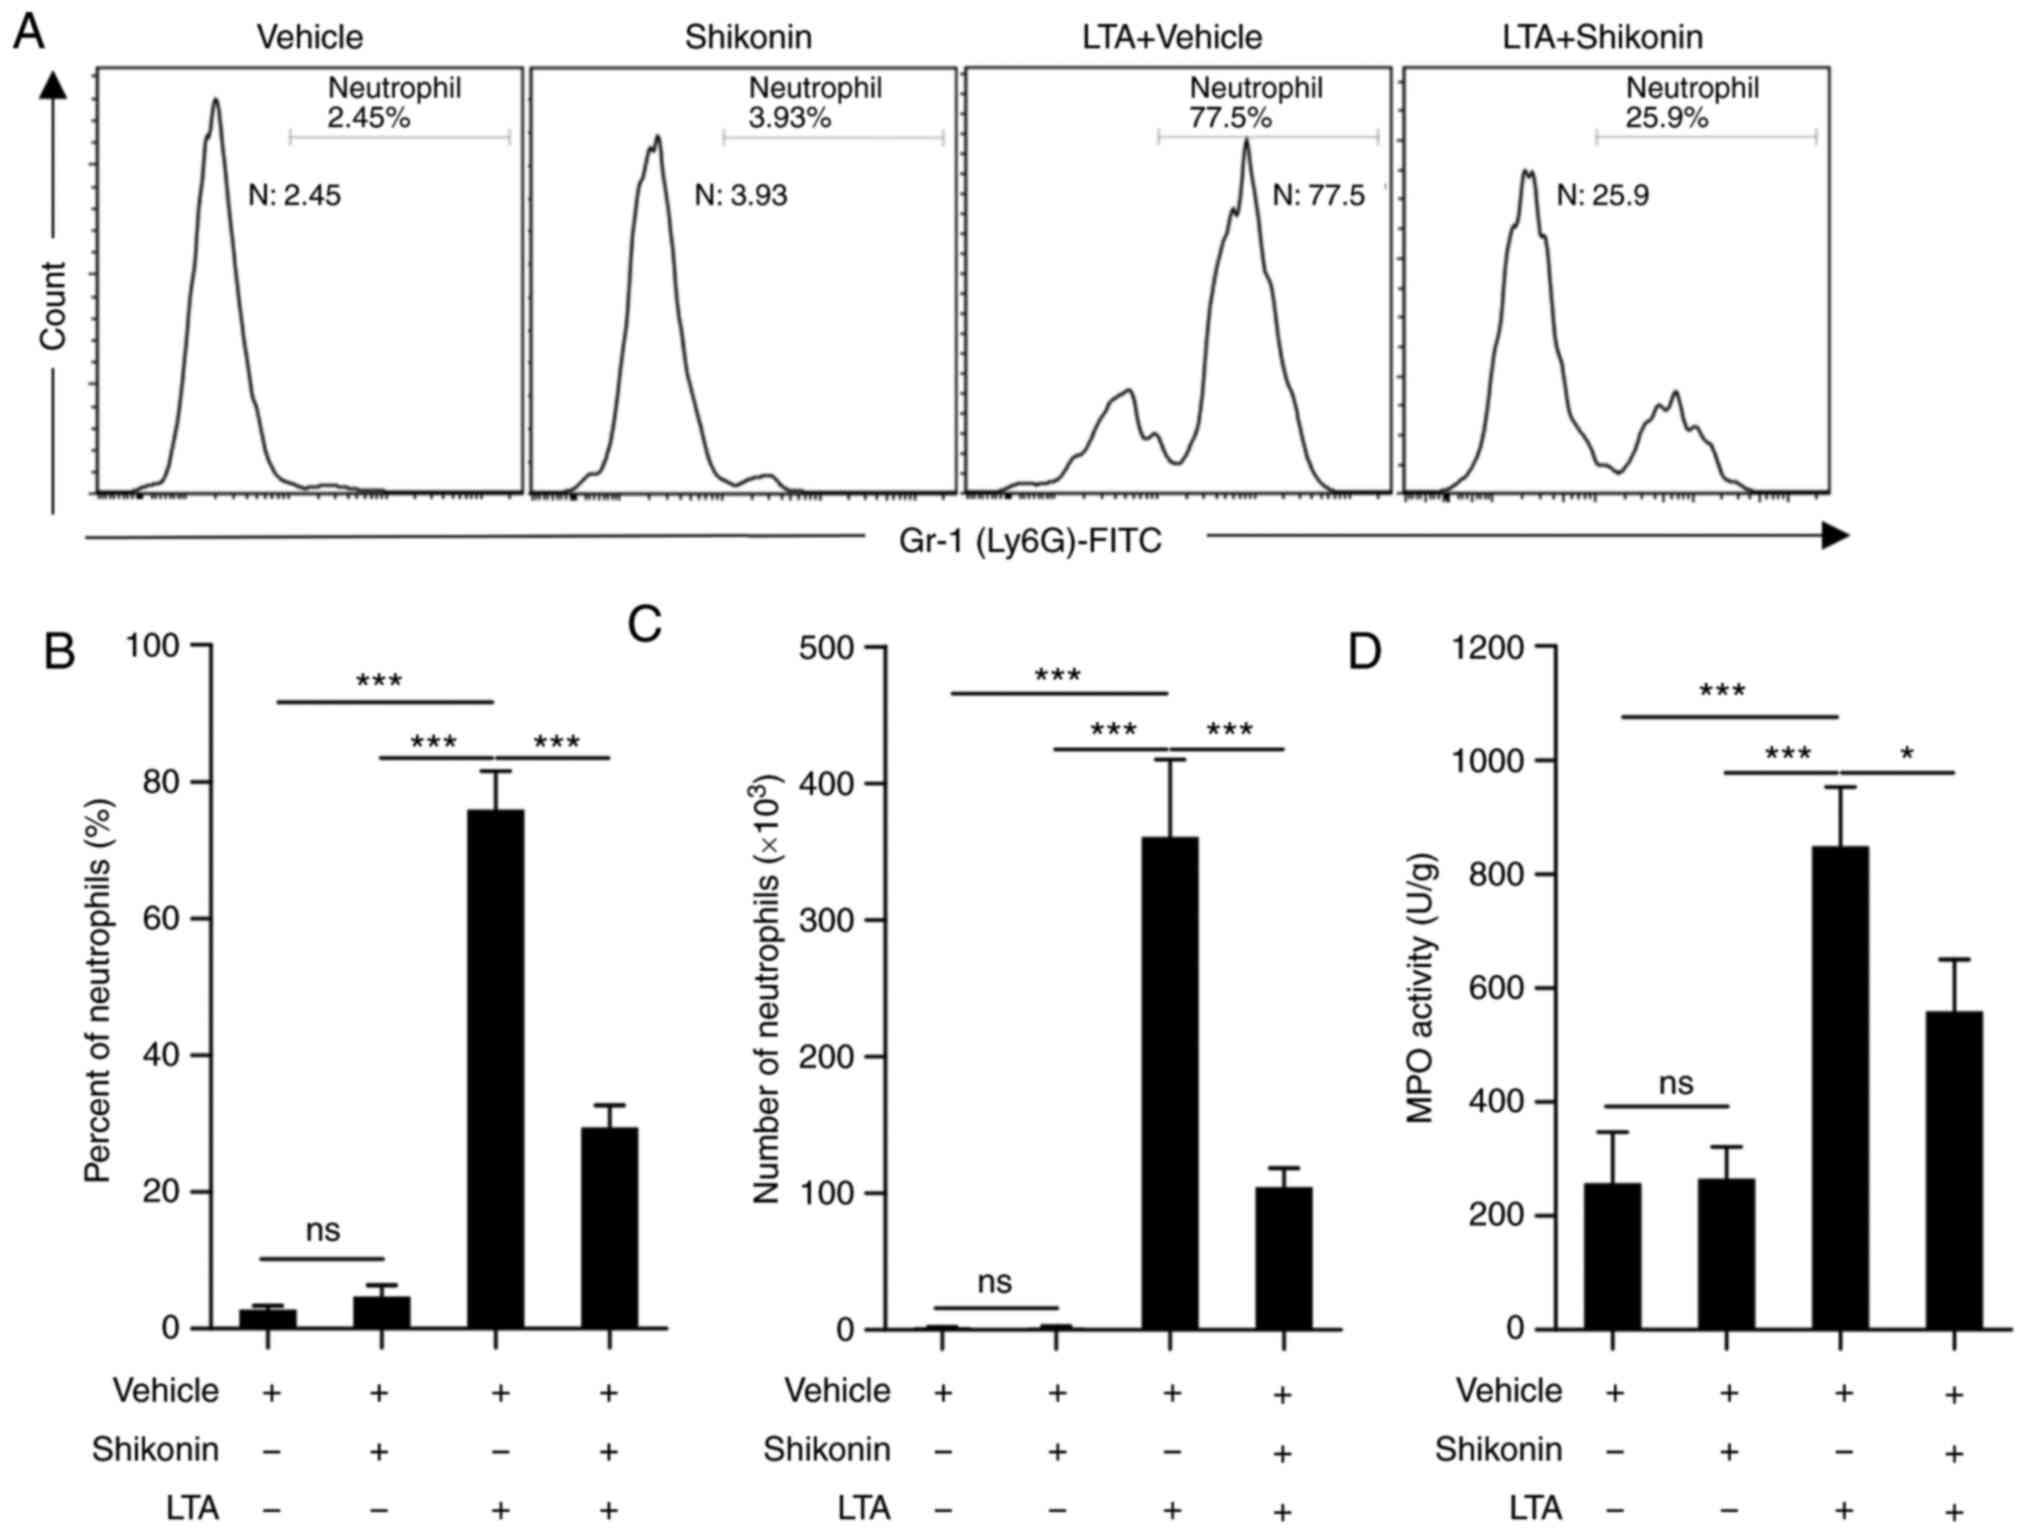 Curdione ameliorates bleomycin-induced pulmonary fibrosis